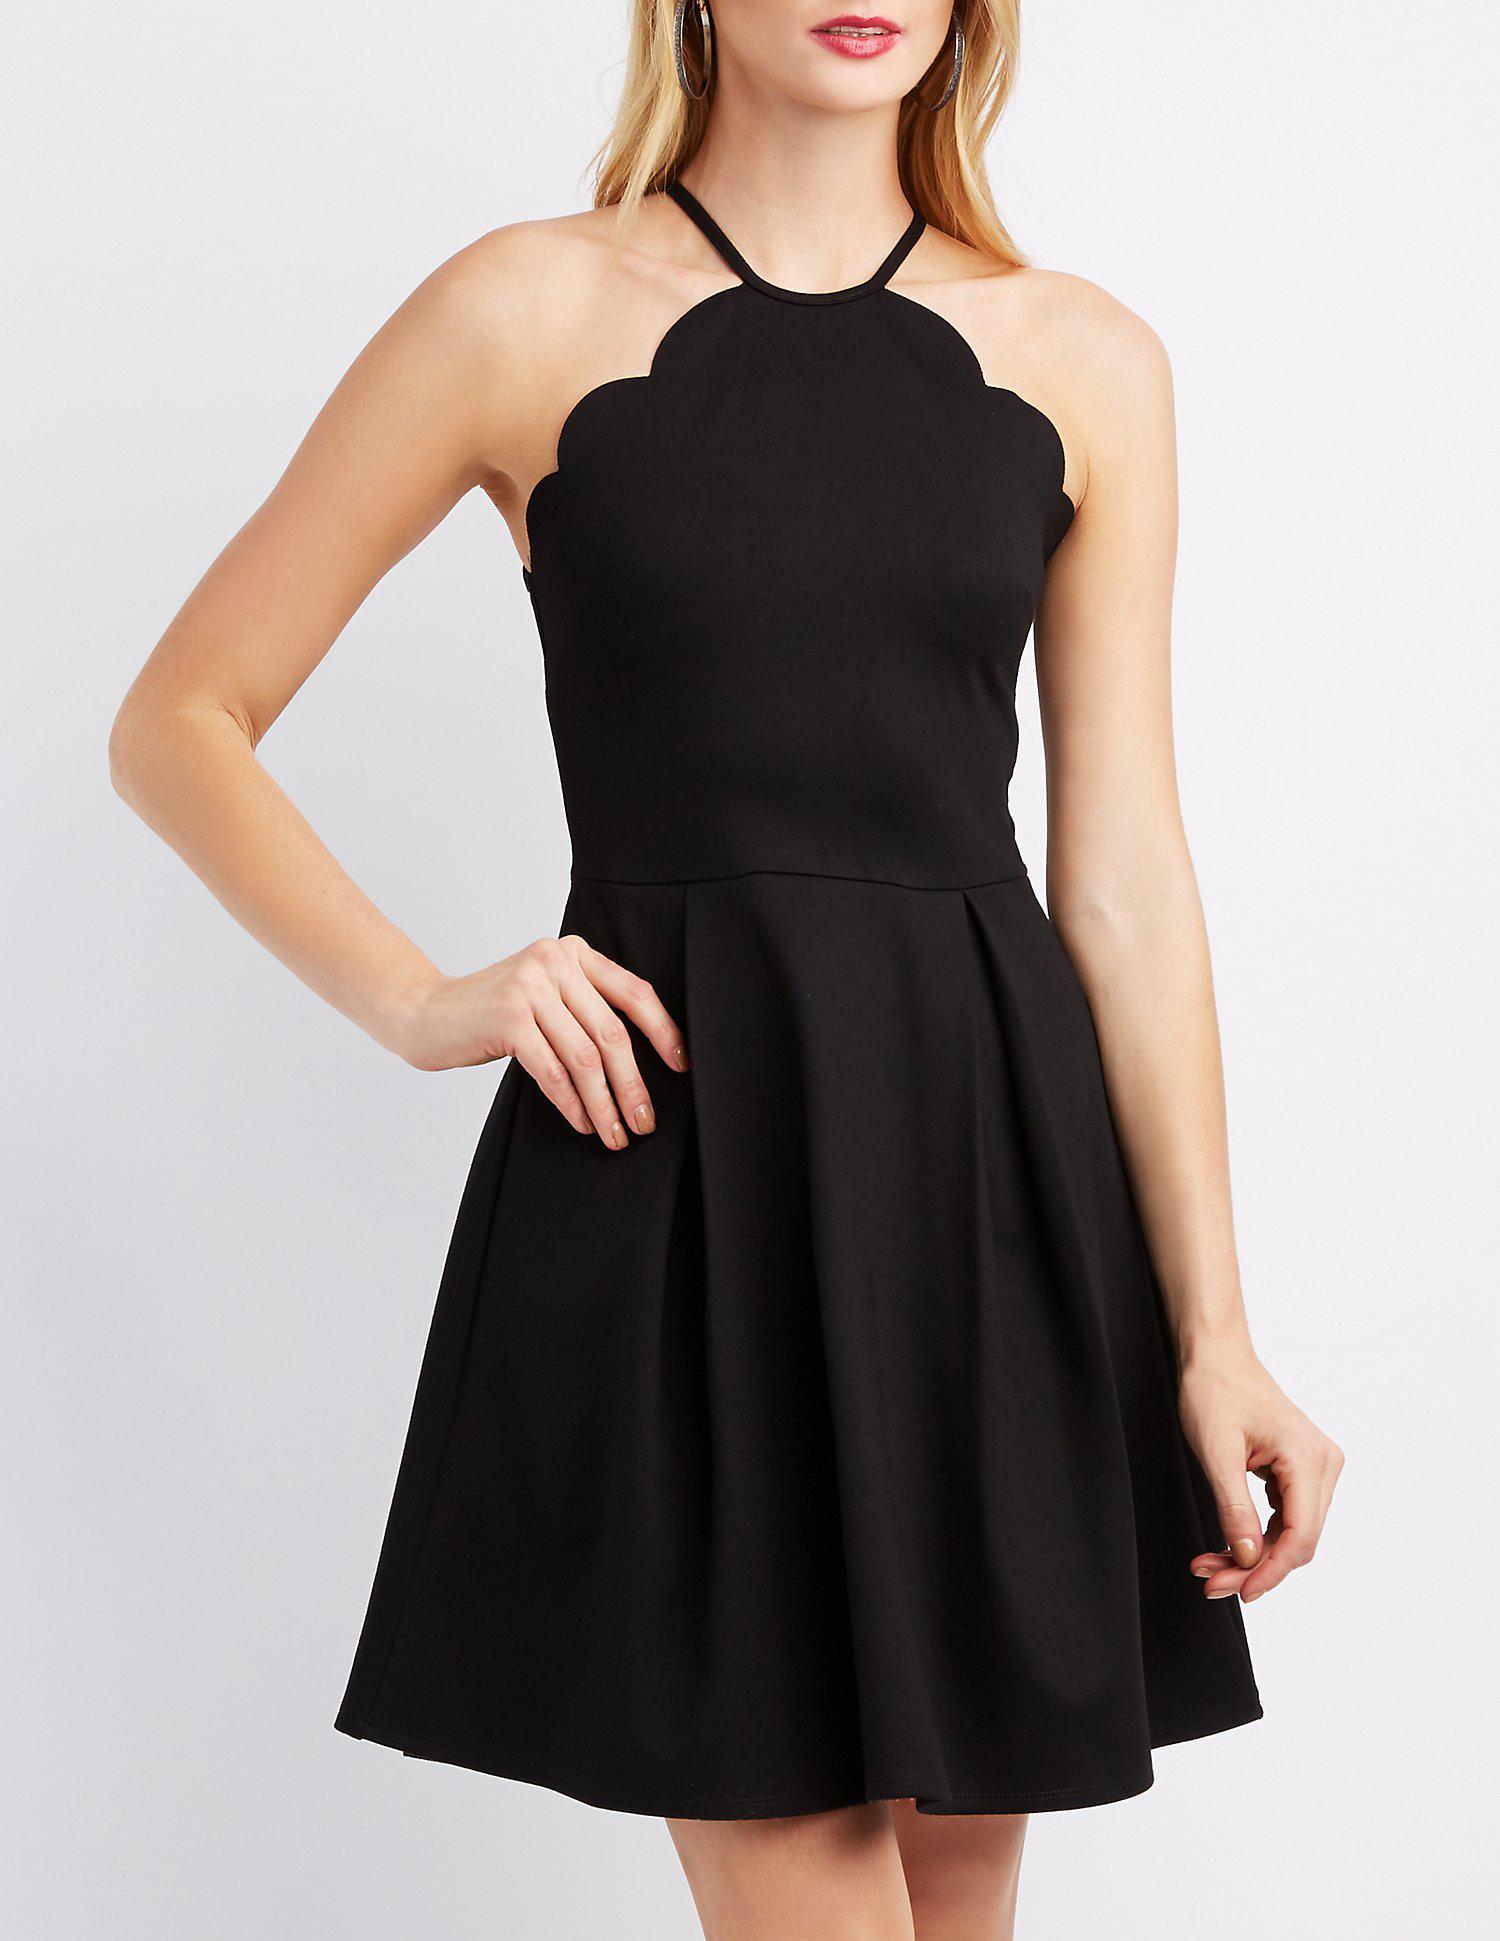 07960ee6acad Lyst - Charlotte Russe Scalloped Bib Neck Skater Dress in Black ...